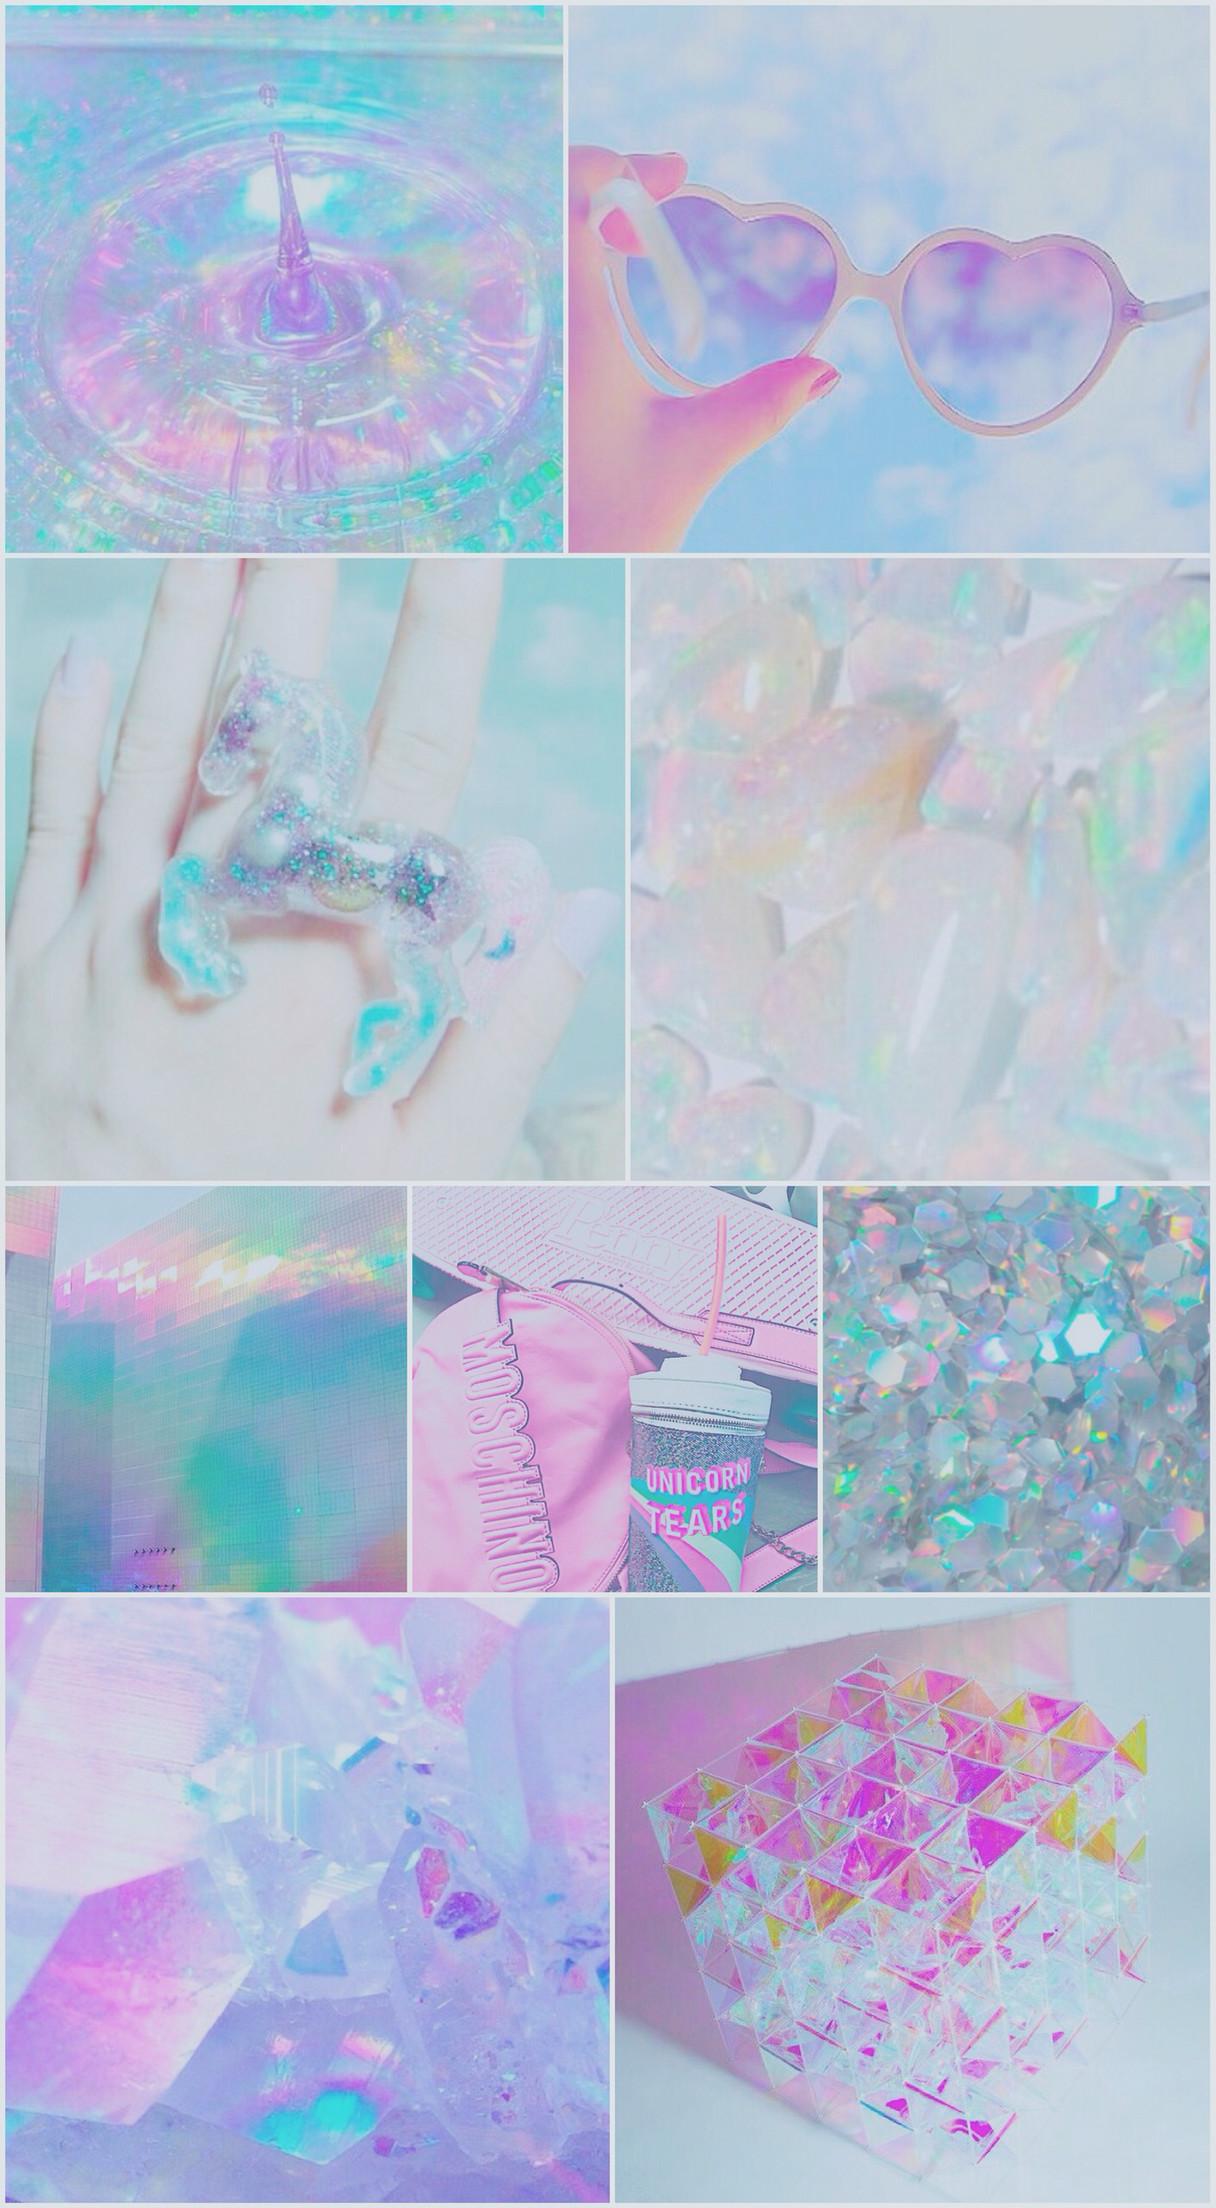 iridescent, wallpaper, background, iPhone, android, unicorn, blue, purple,